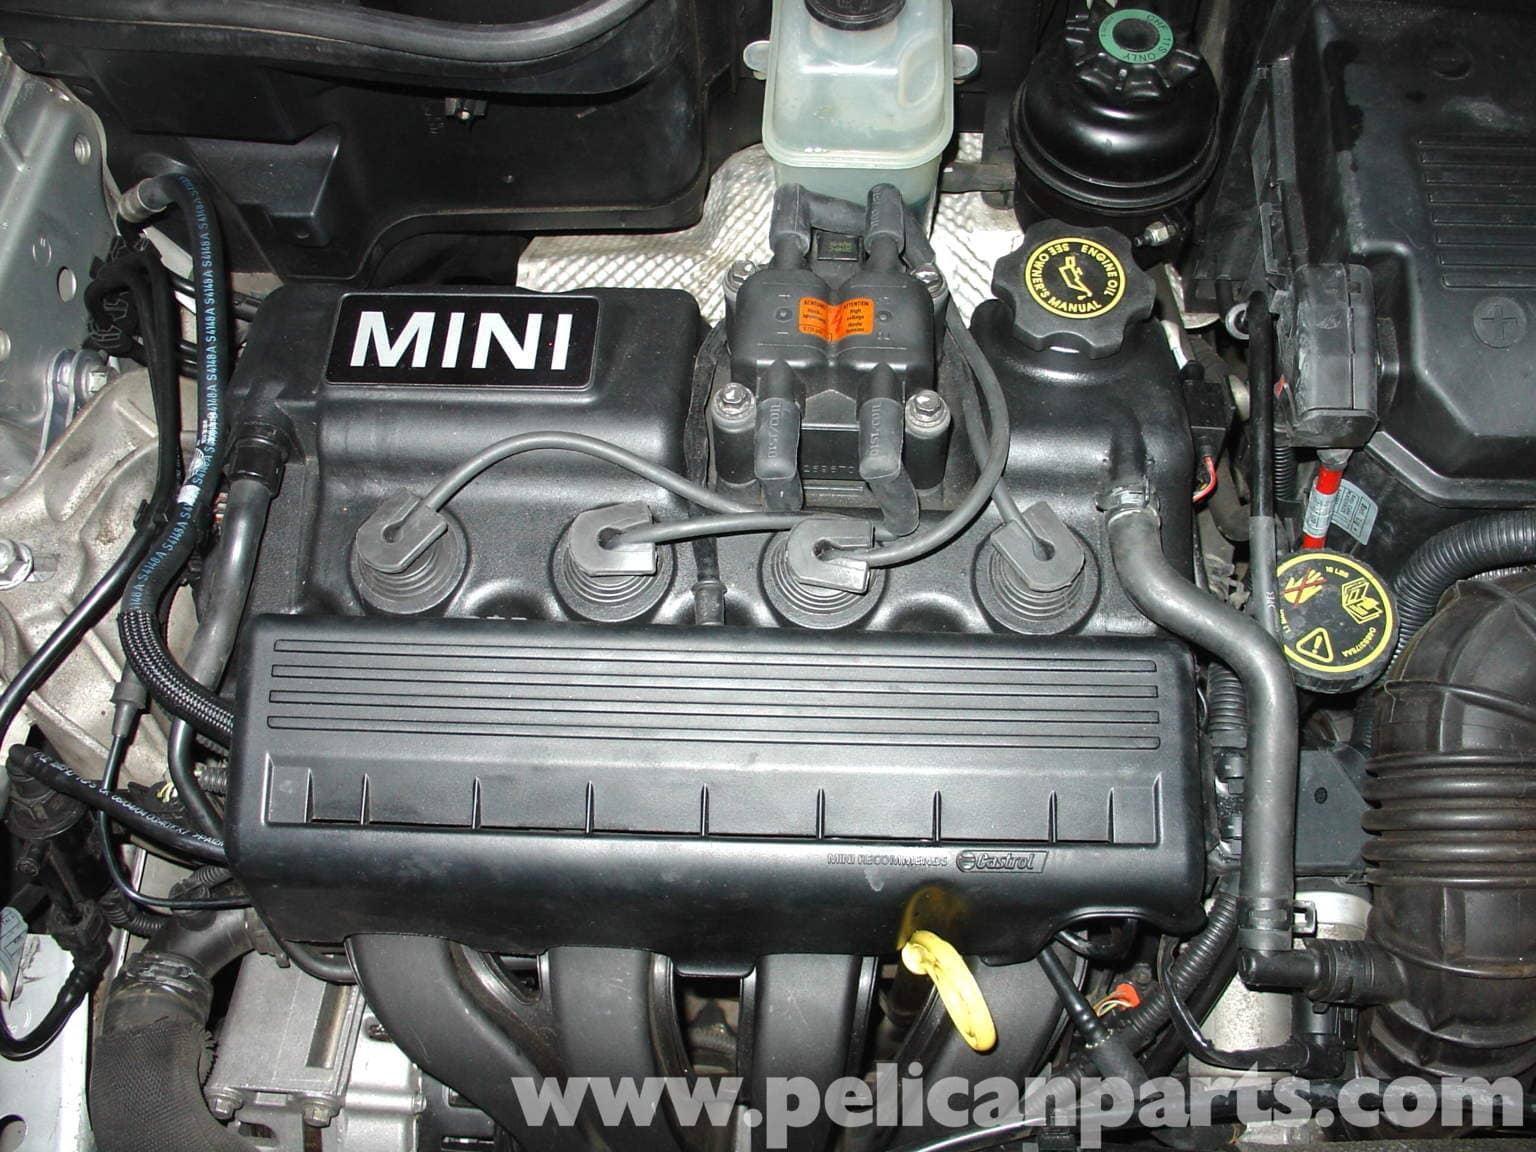 2005 mini cooper engine diagram group electrical schemes 4.0 jeep wrangler engine diagram pictures 2005 mini cooper s engine diagram